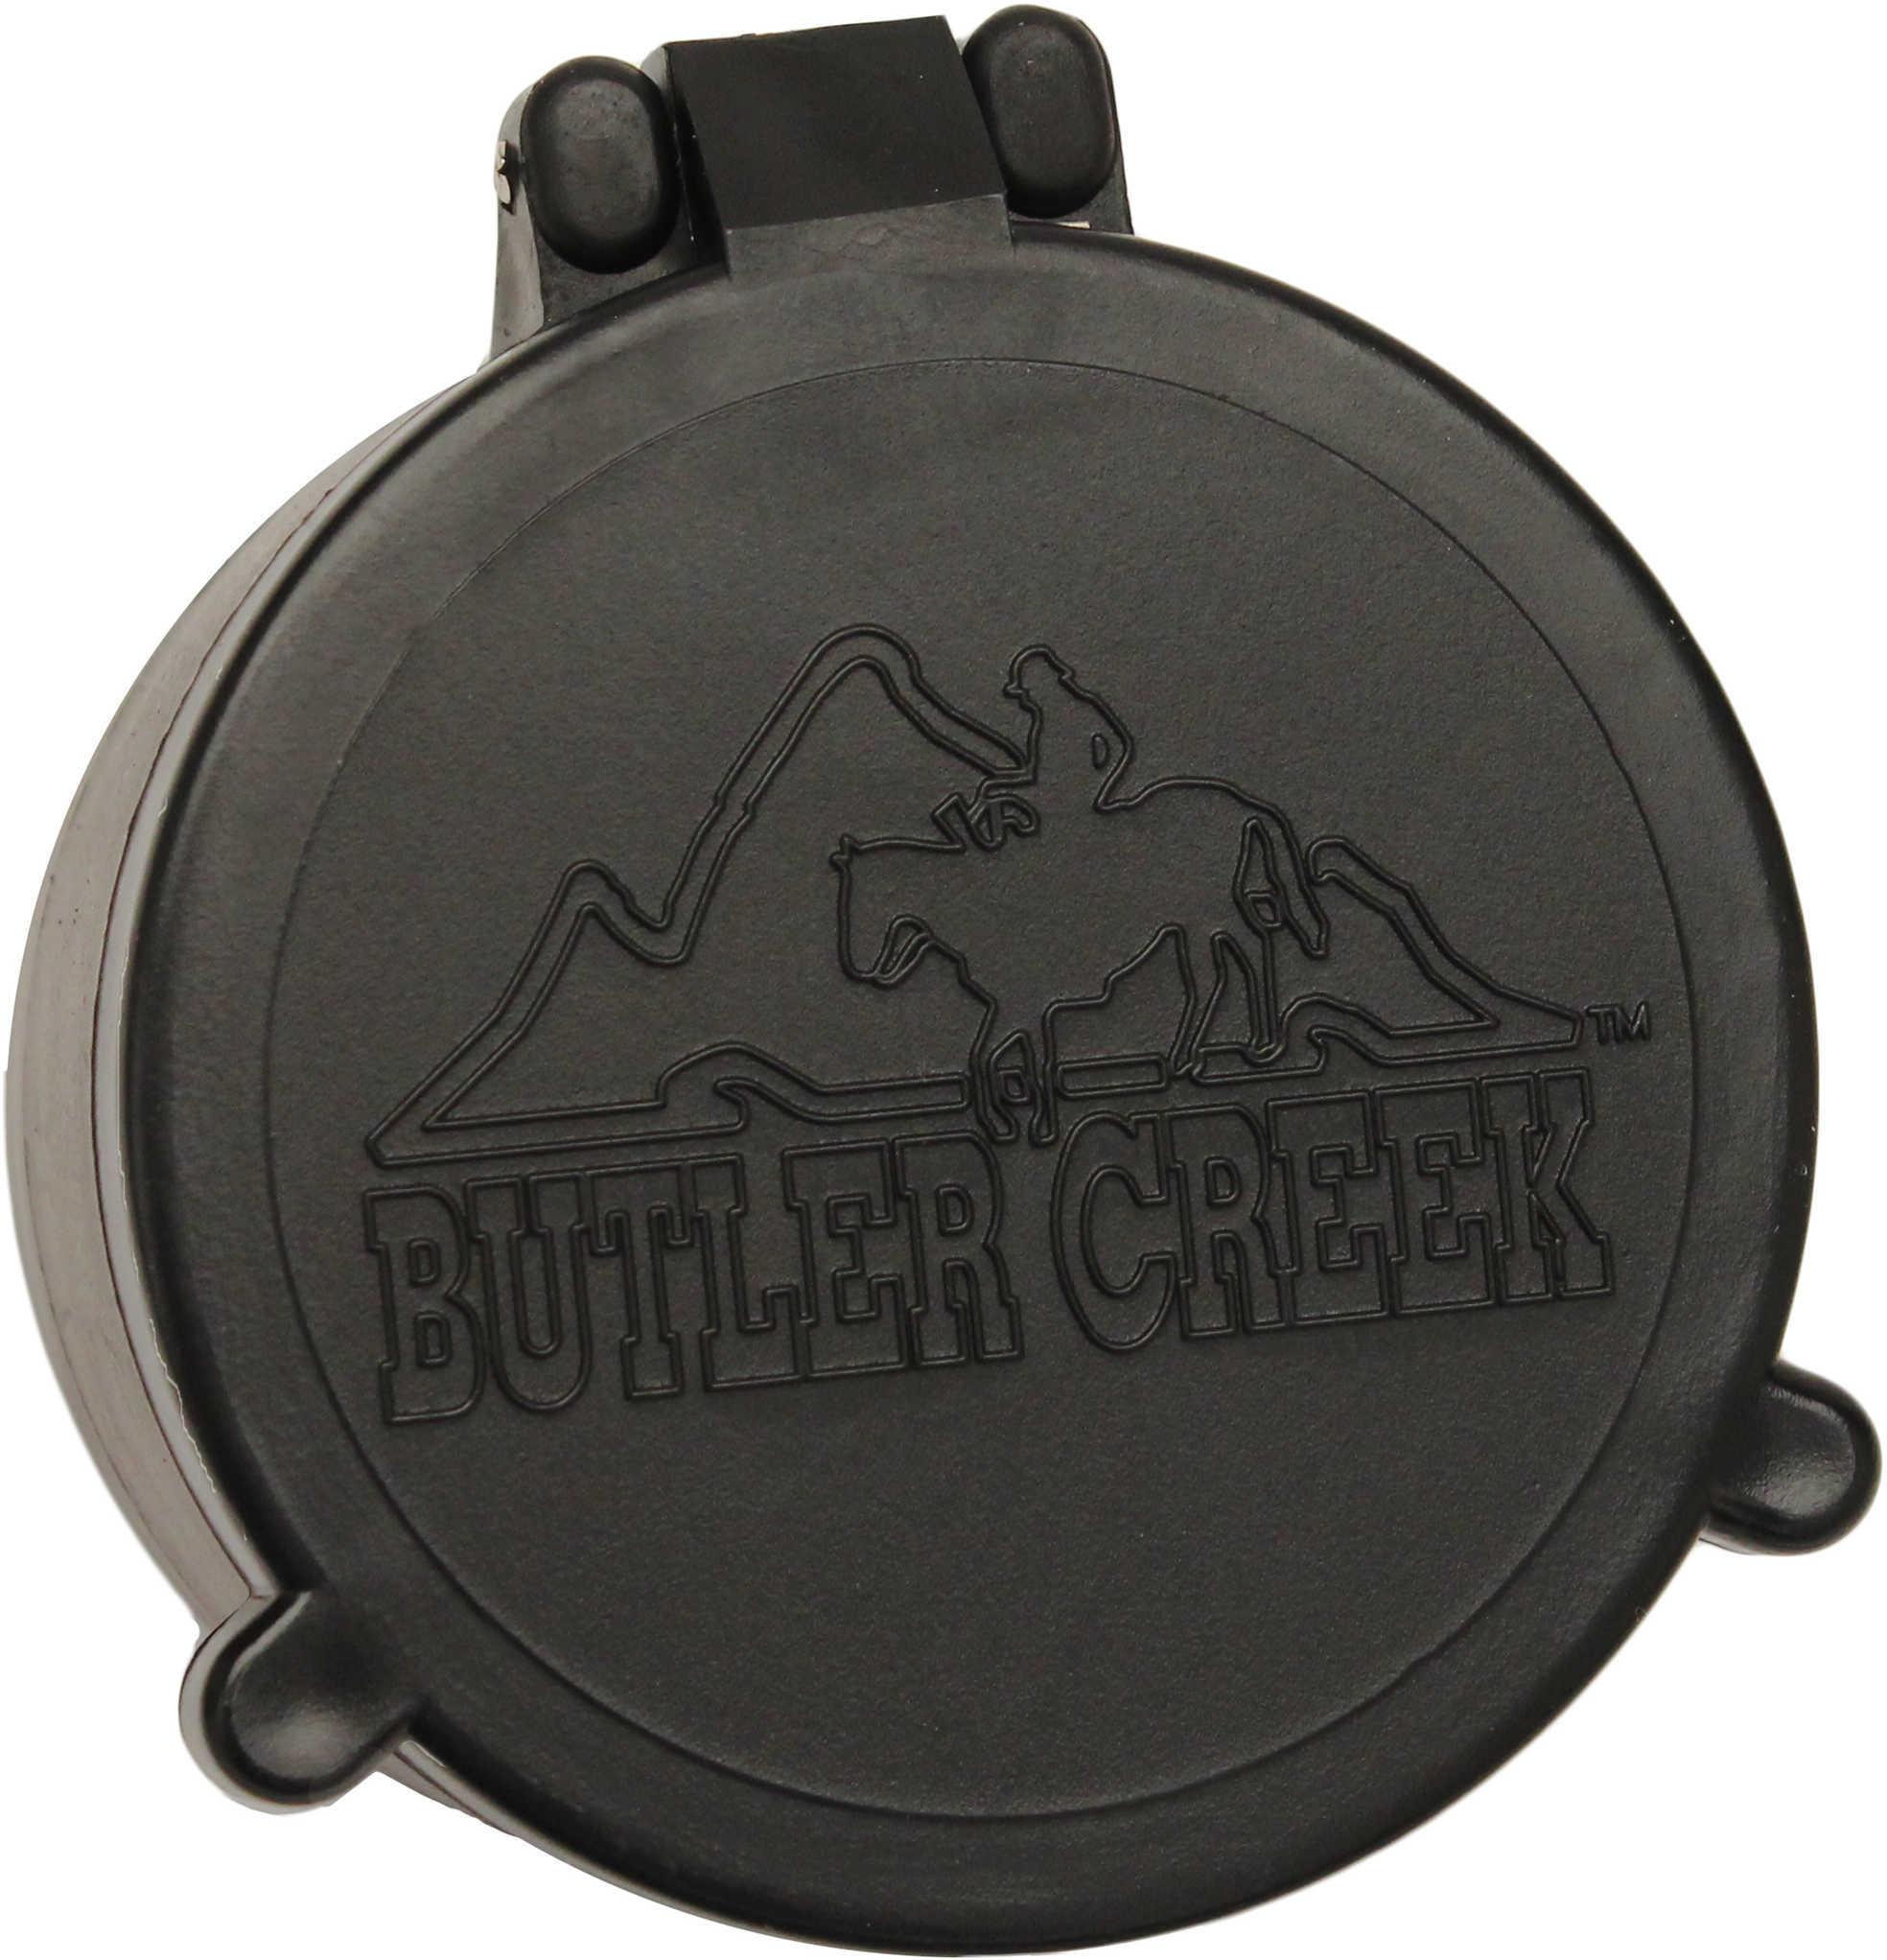 Butler Creek Flip Open #29 Objective Scope Cover